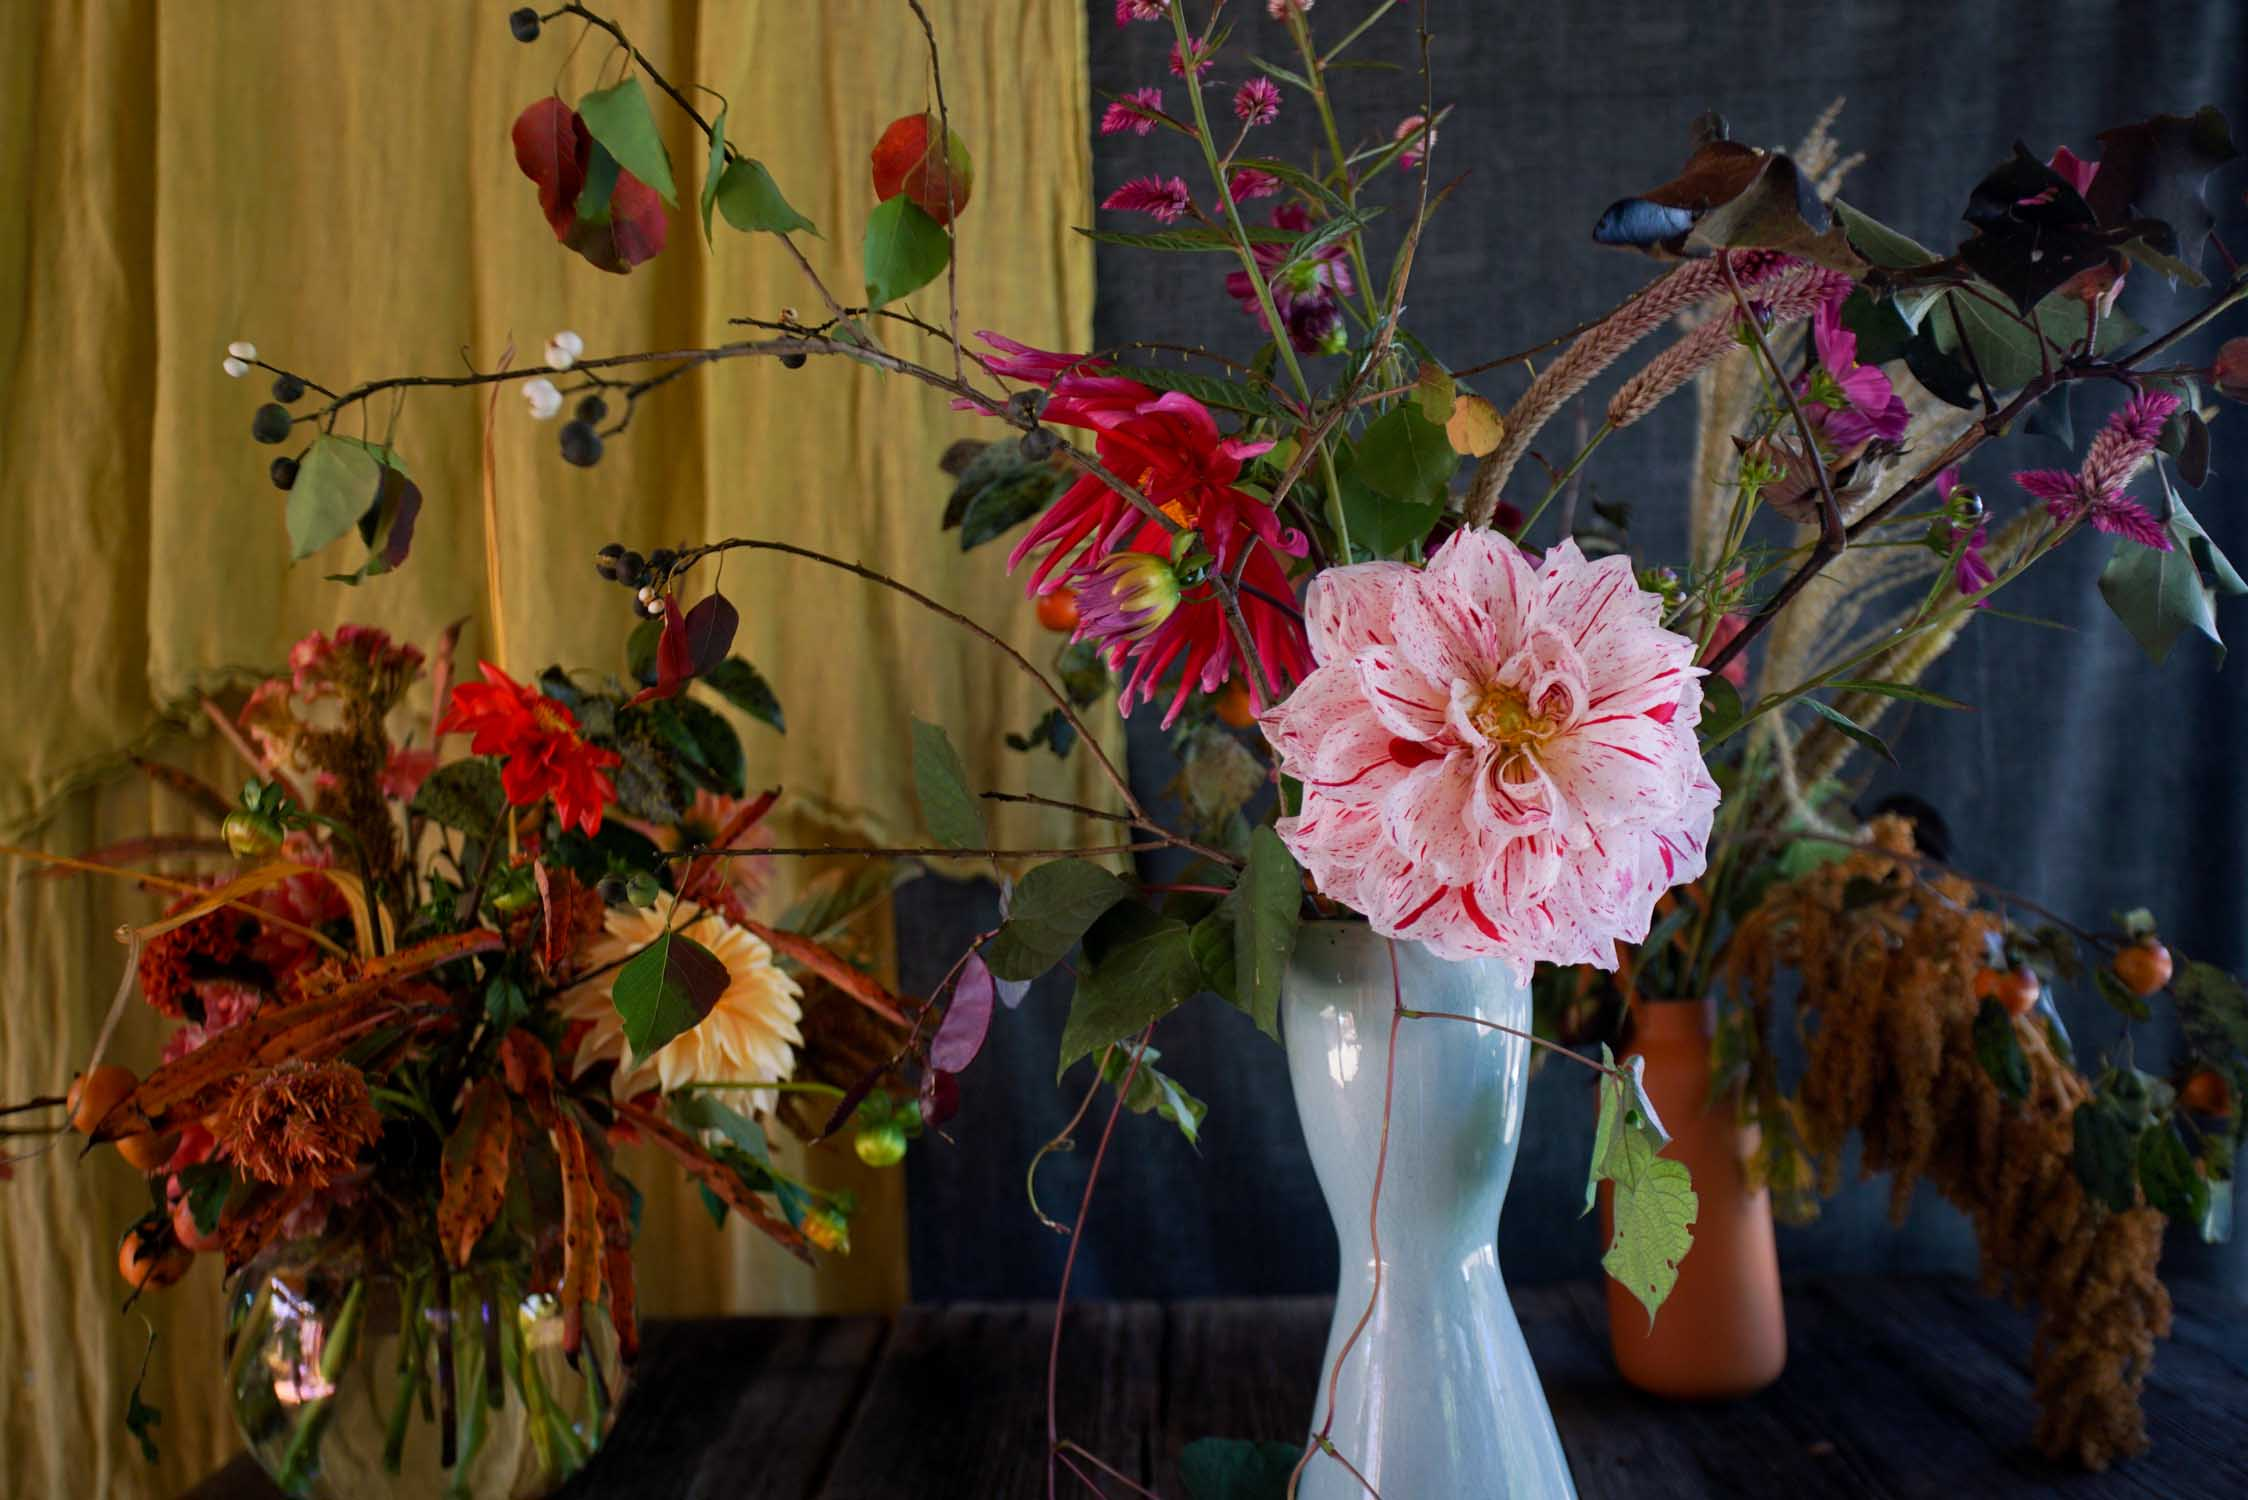 RA_3 porch farm 2016 flower social-2016101709118.jpg